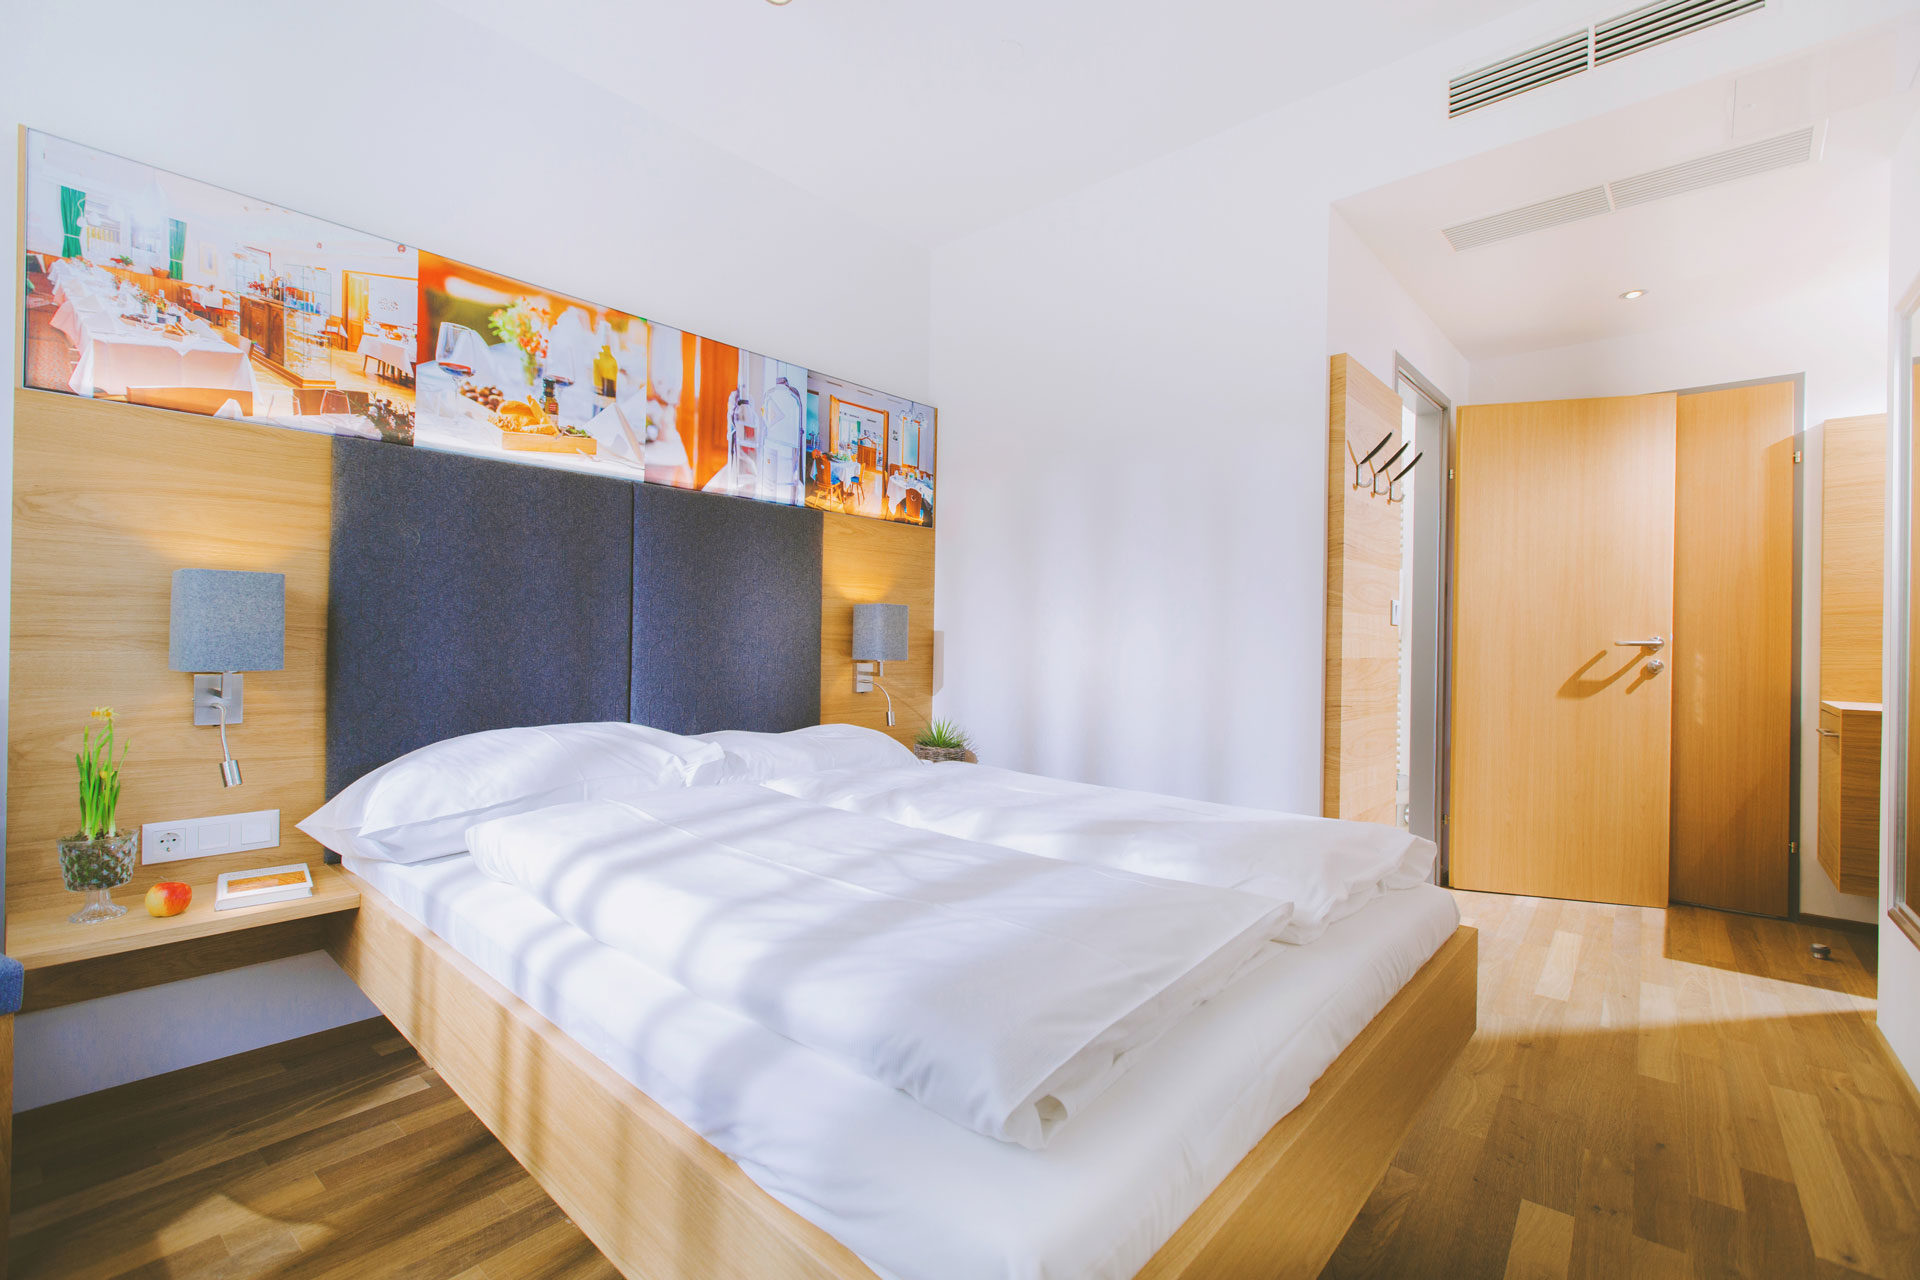 gasthof-zur-traube-doppelzimmer5